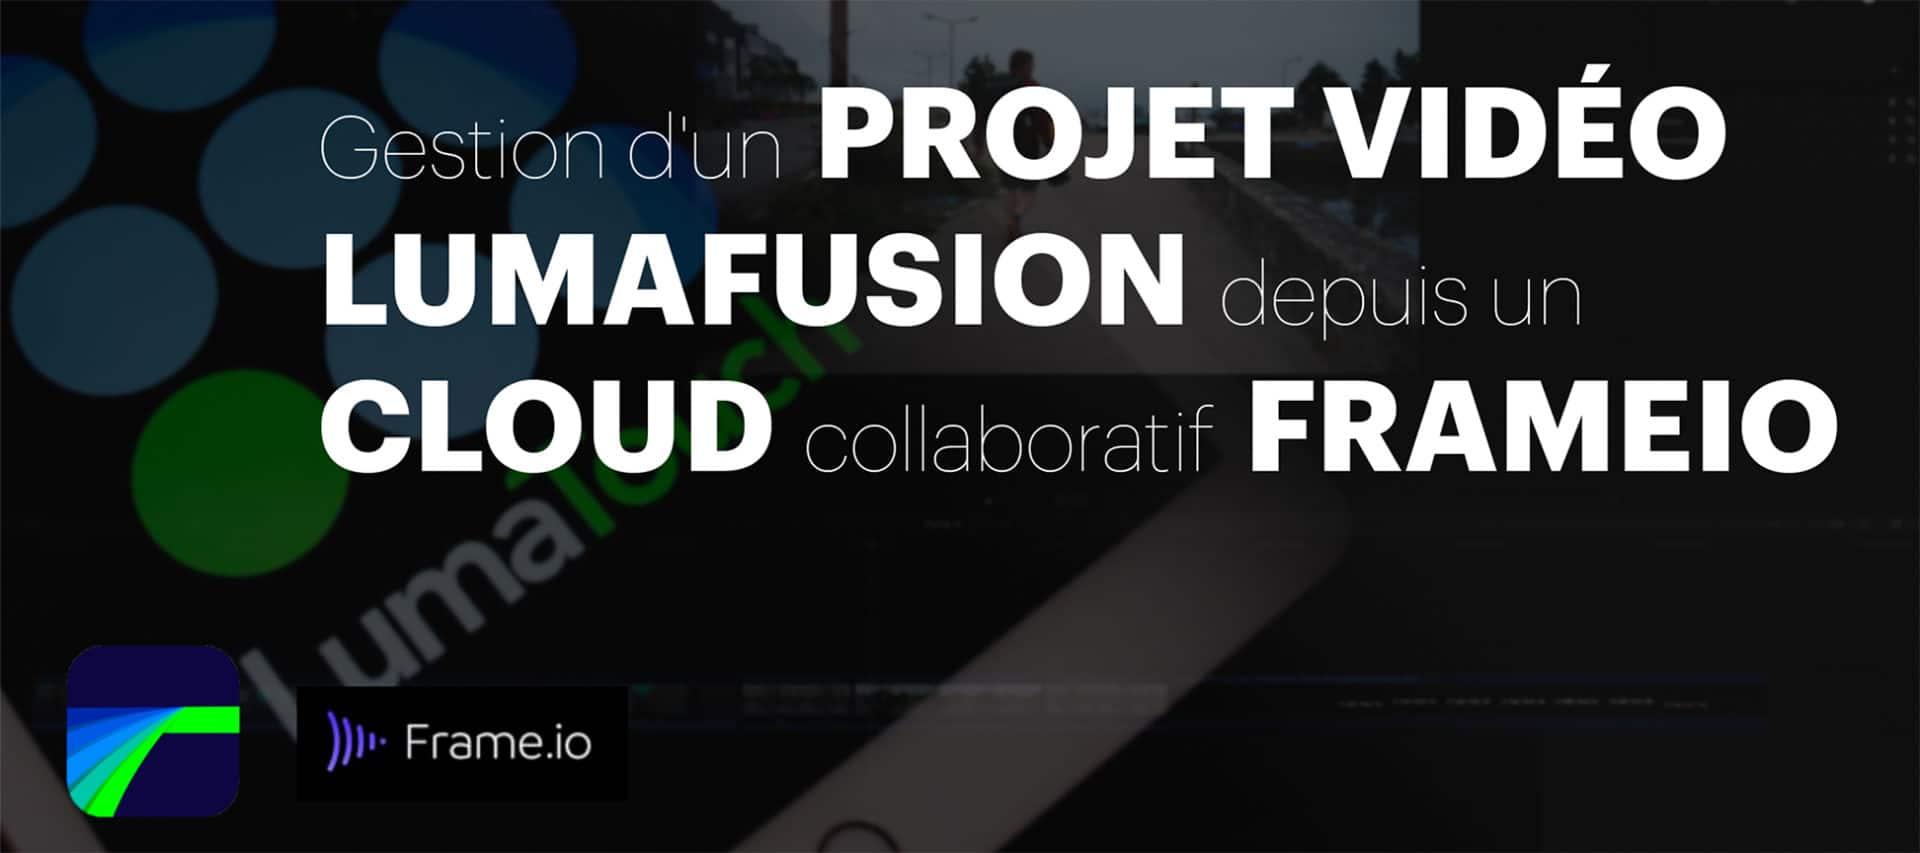 Tuto Gestion d'un projet vidéo LumaFusion depuis un Cloud collaboratif FrameIO